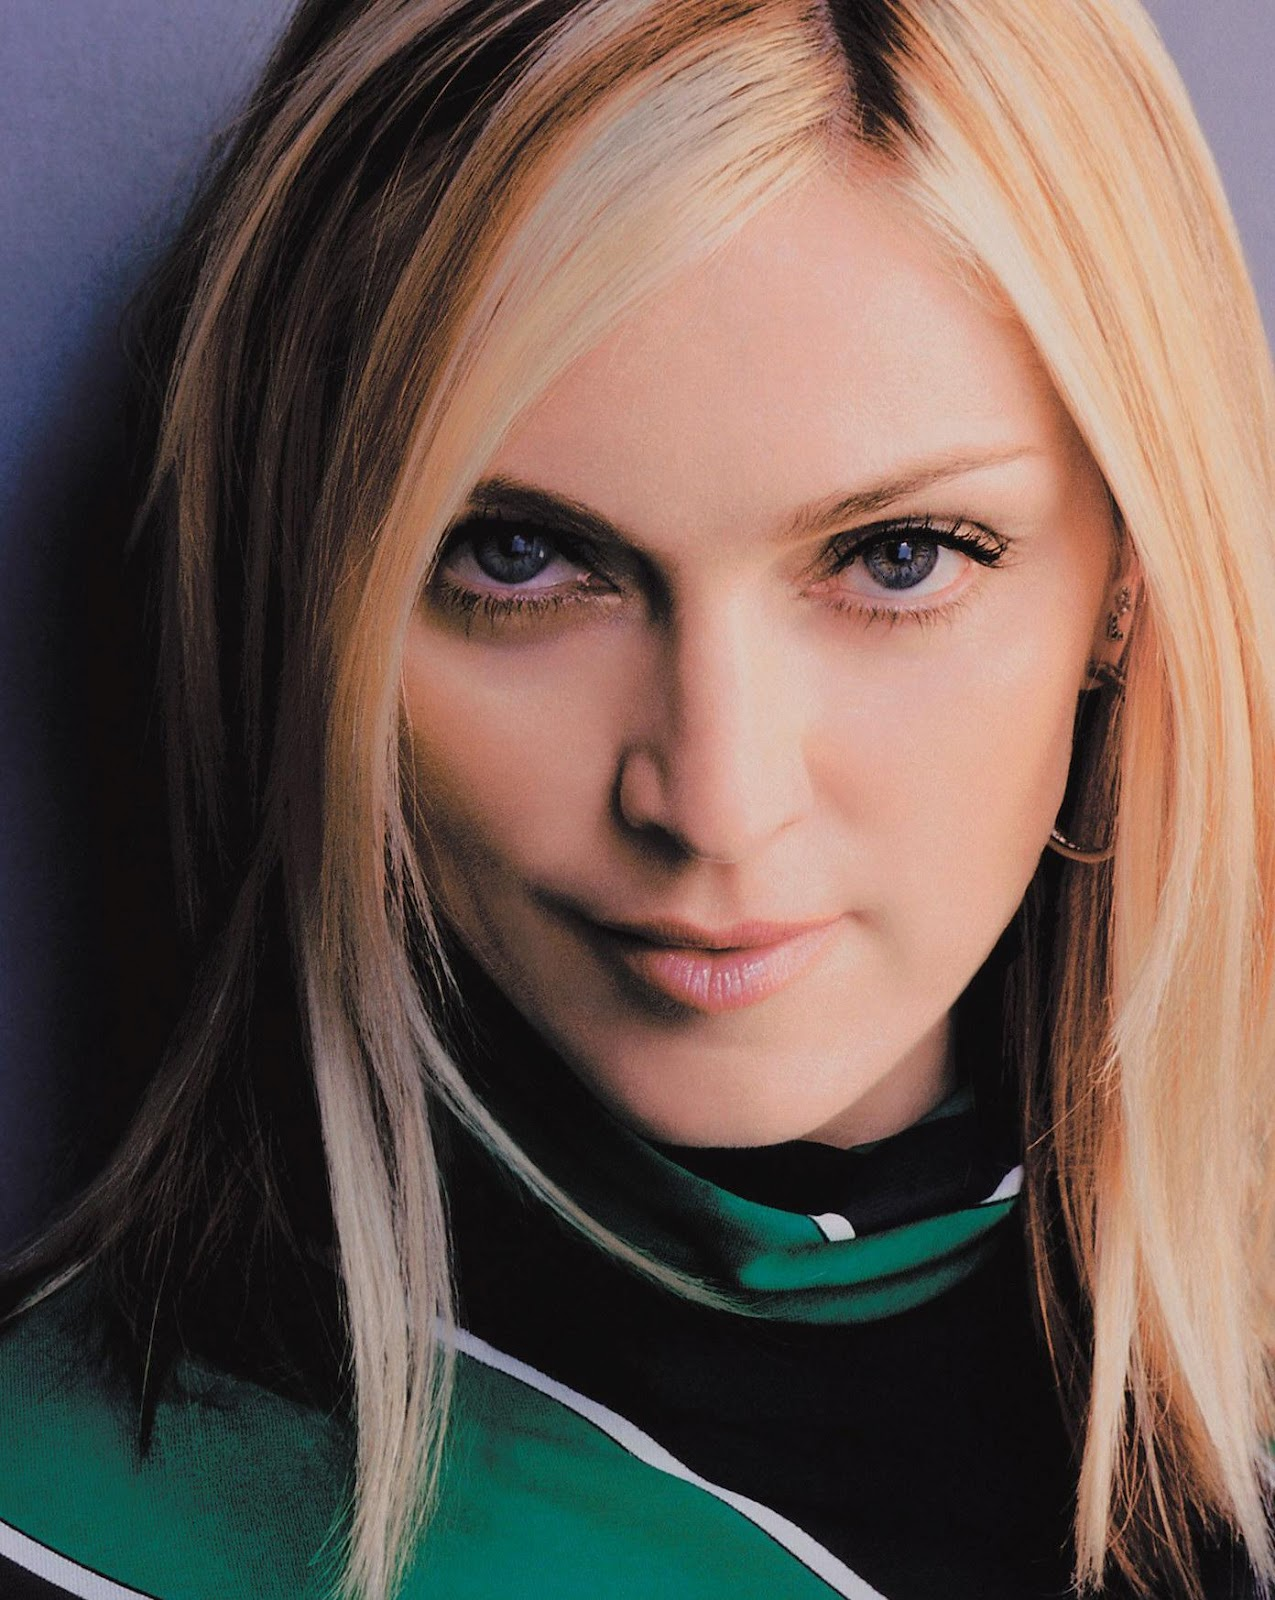 http://4.bp.blogspot.com/-ab4n1-YxBF8/T1mrHd-brZI/AAAAAAAAB8M/MMhFlEy-BKk/s1600/Madonna-world+music+(3).jpg